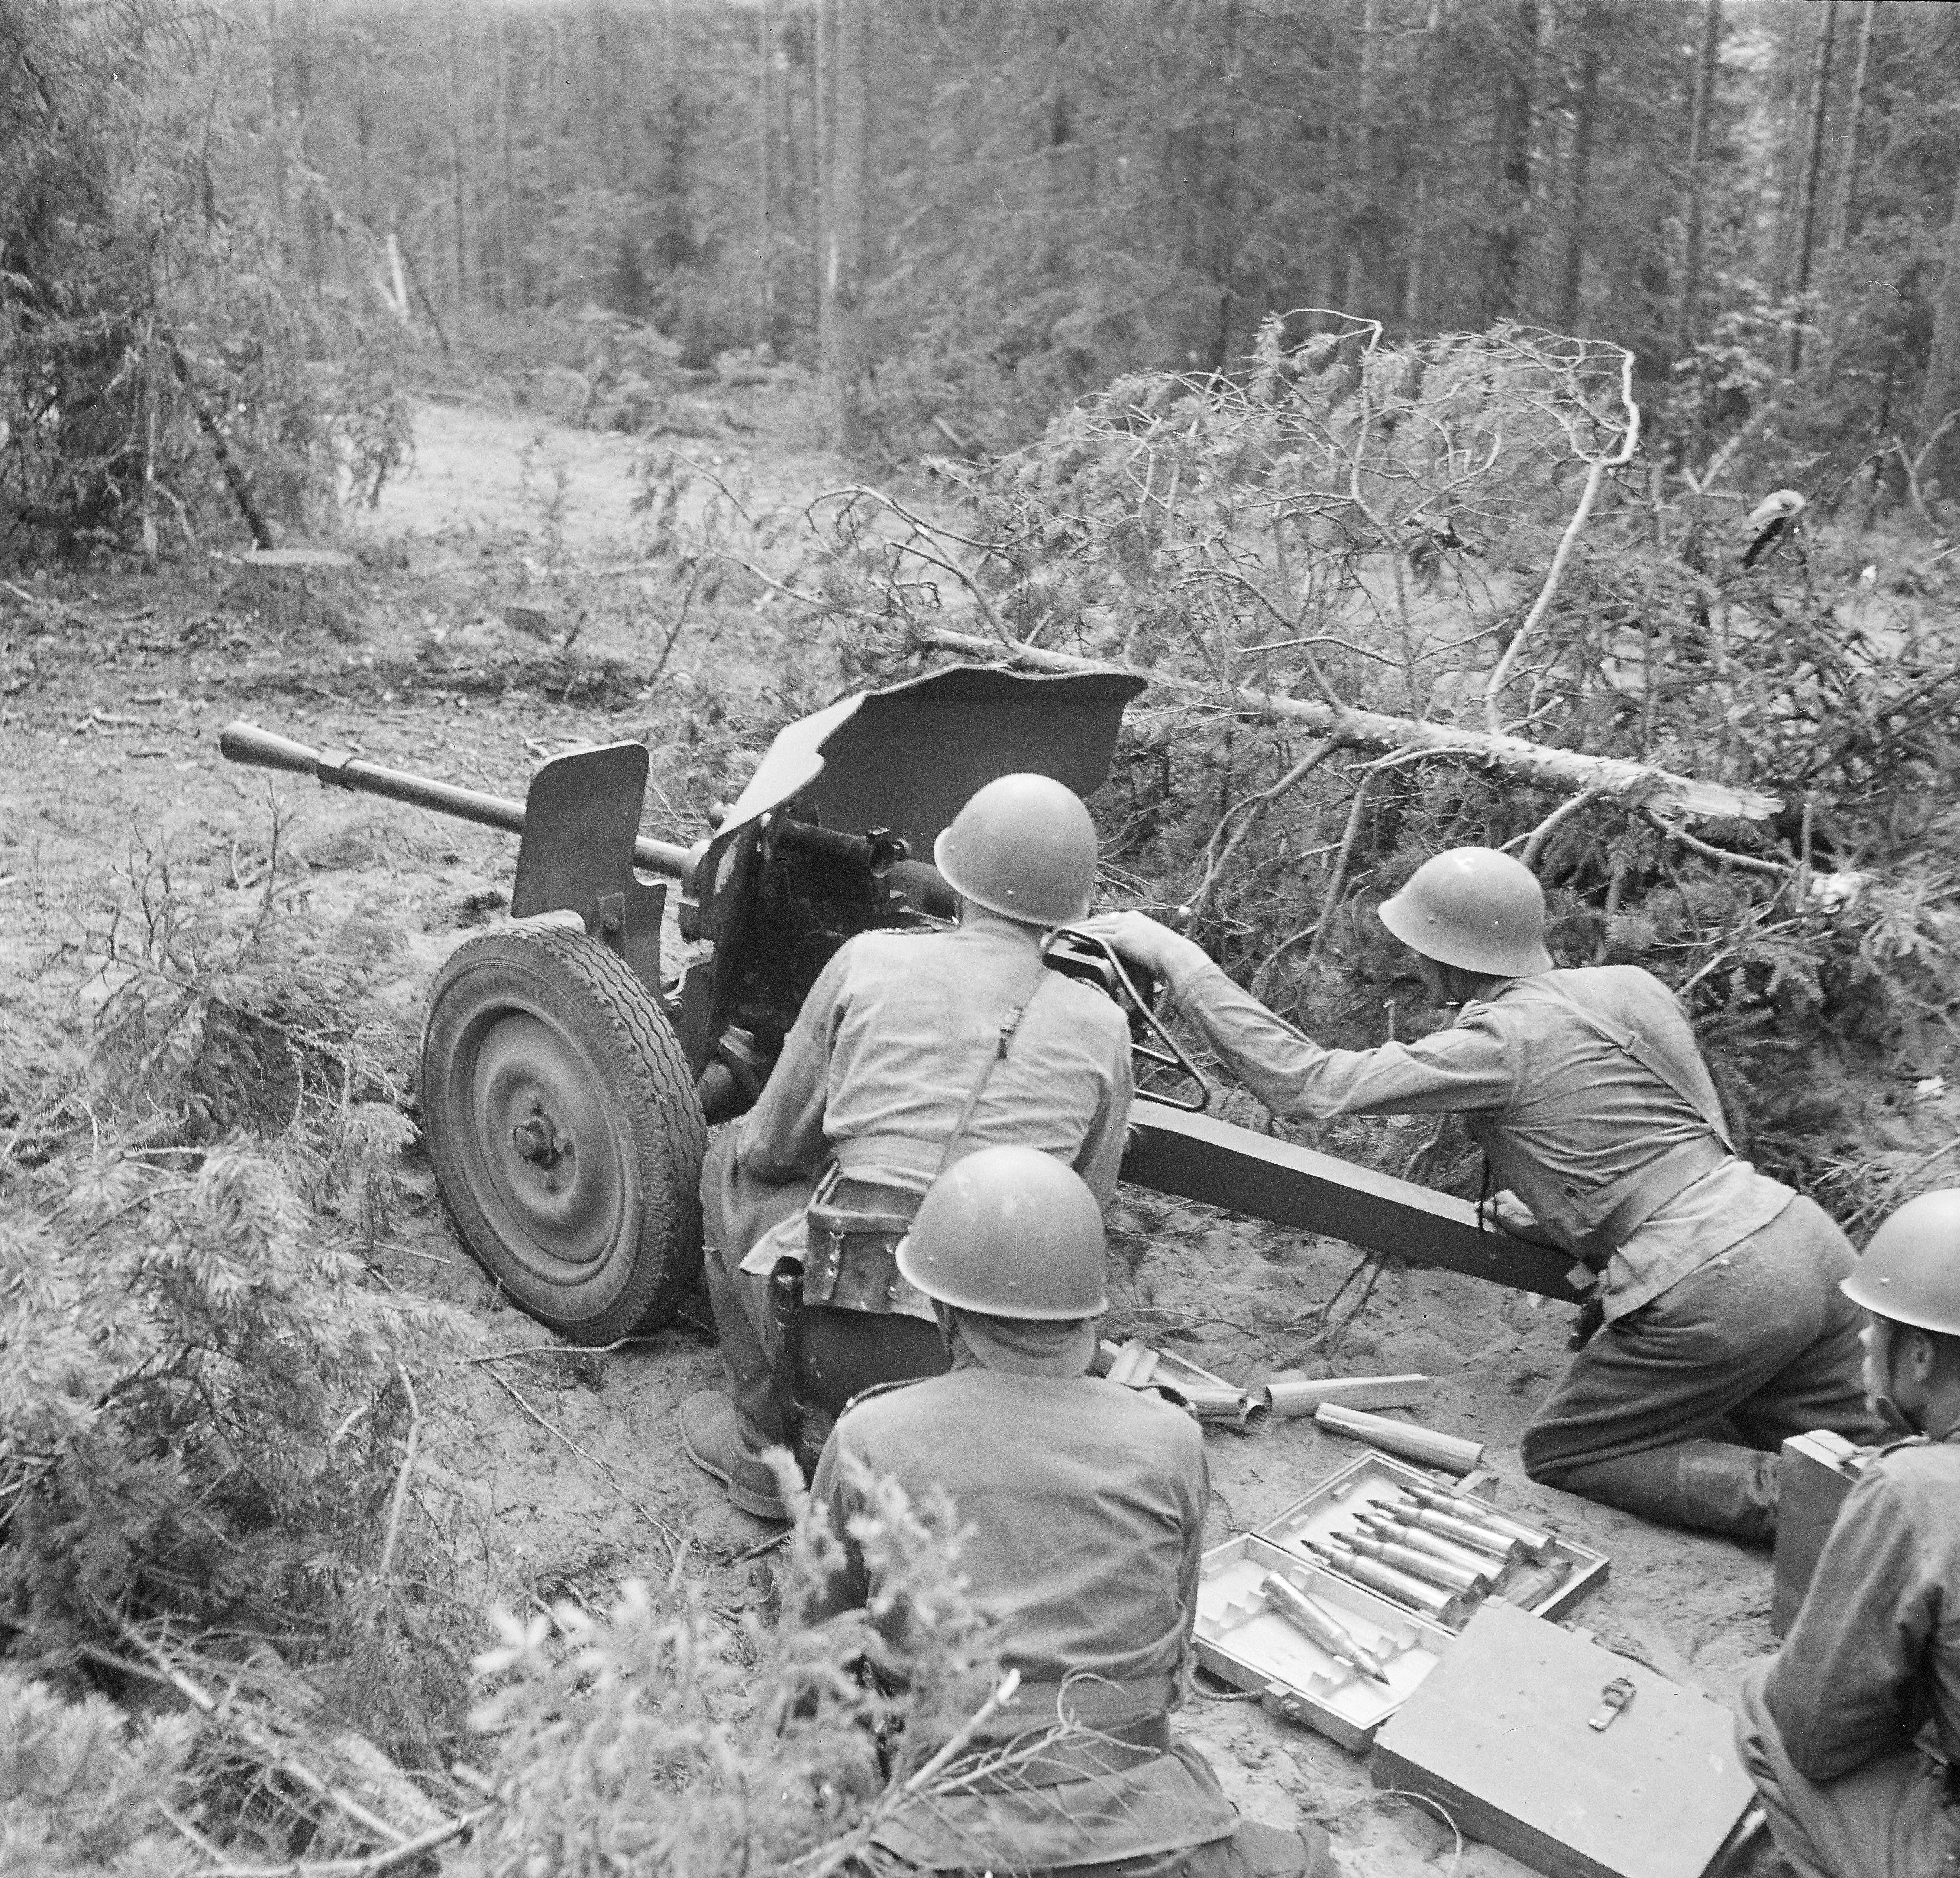 File:25 PstK34 anti-tank gun photo SA-kuva 27890 jpg